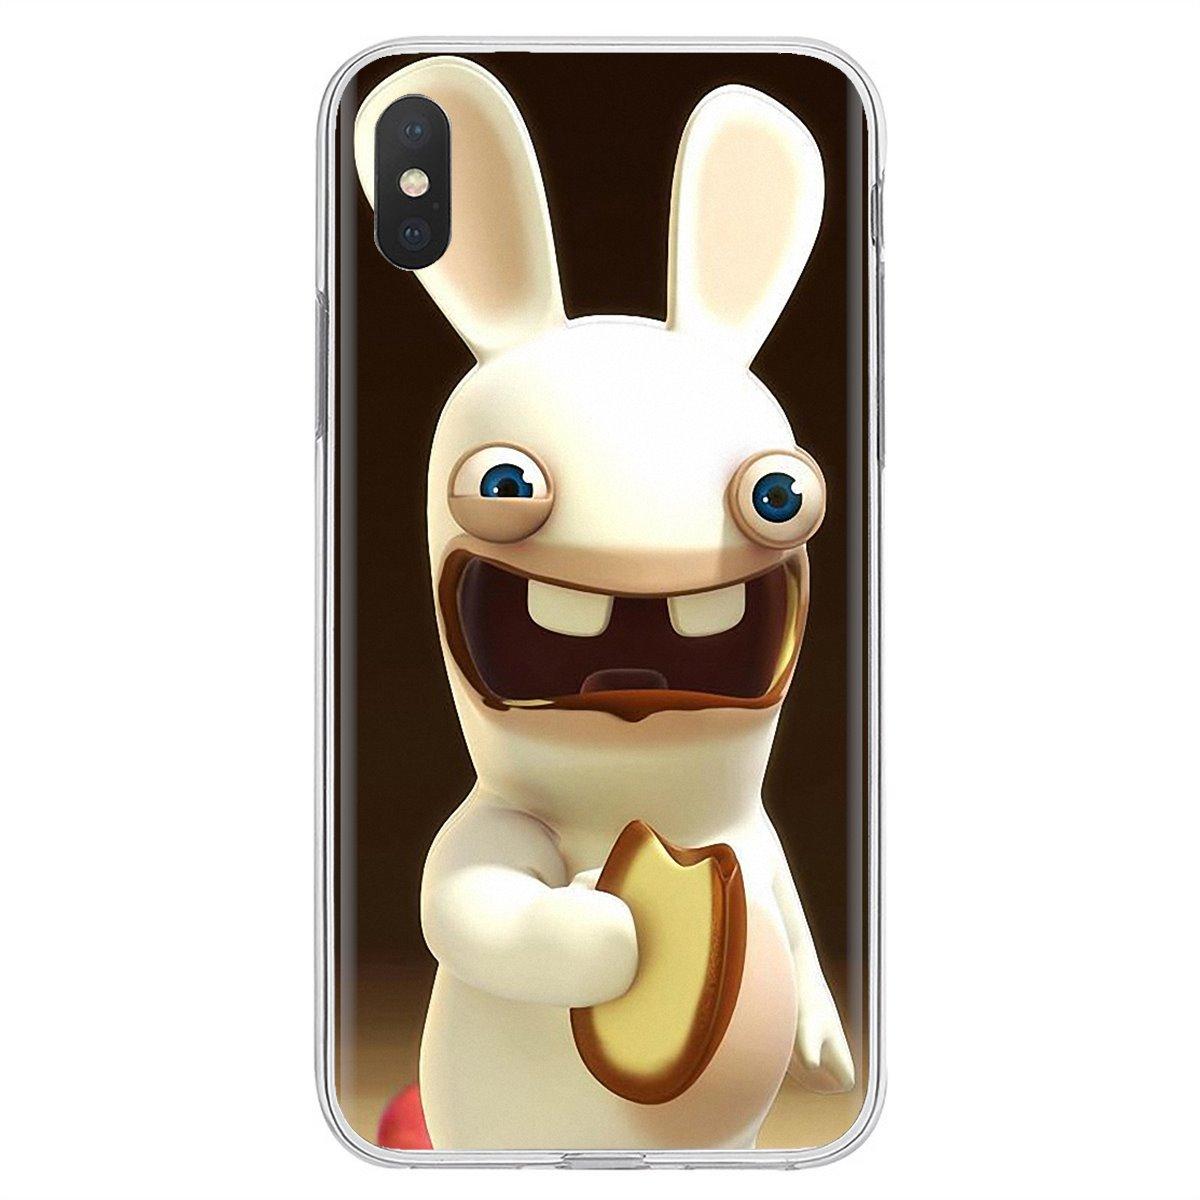 Rabbids lapin cretino naruto dibujos animados para Huawei Nova 2 3 2i 3i Y6 Y7 Y9 primer Pro GR3 GR5 2017, 2018 de 2019 Y5II Y6II suave funda de piel